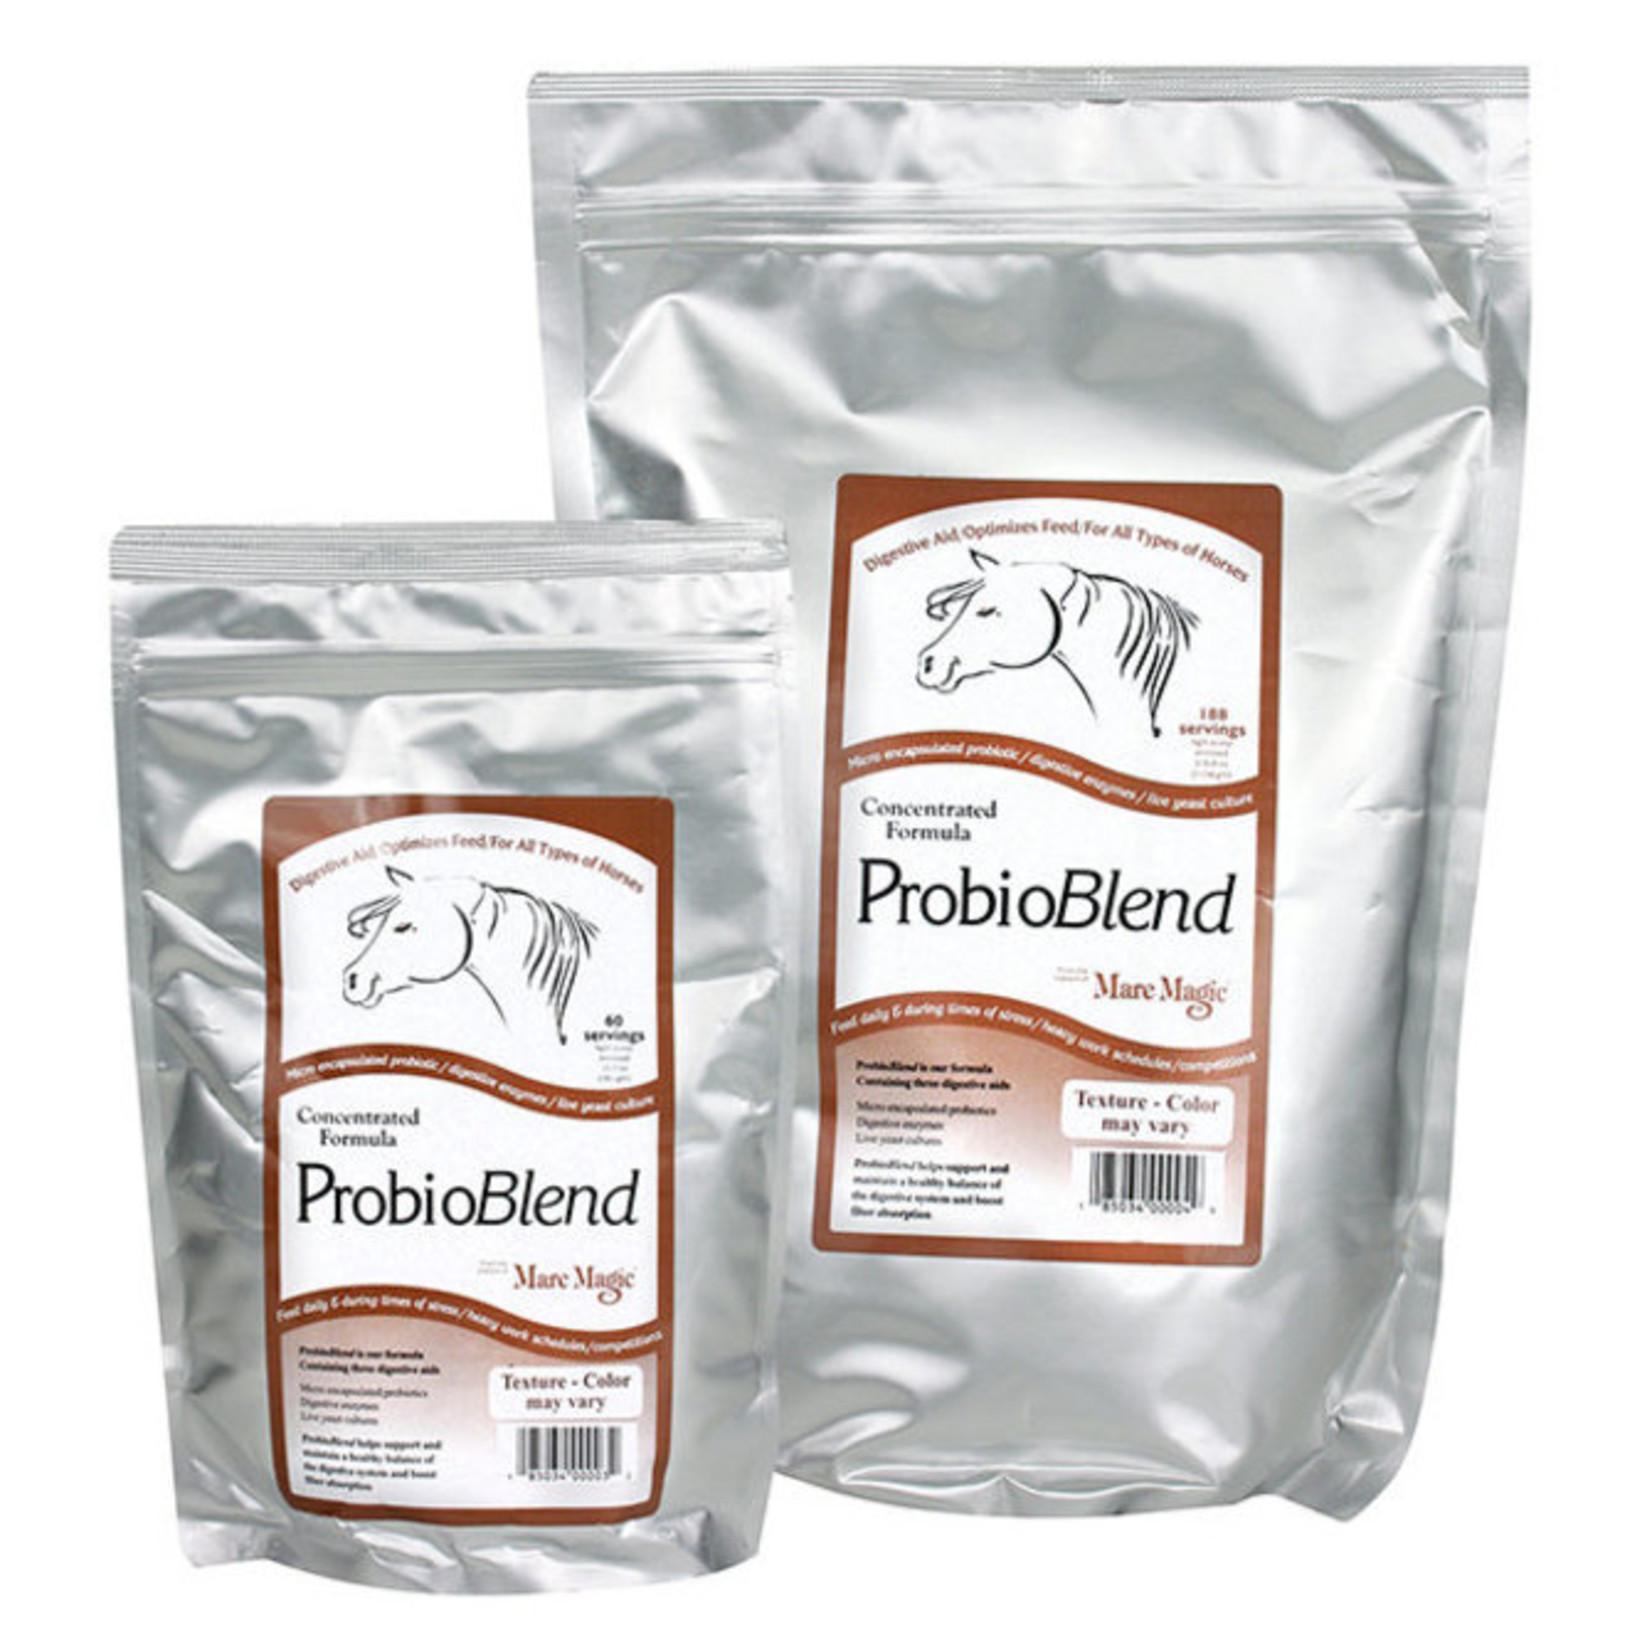 ProbioBlend 12.7oz